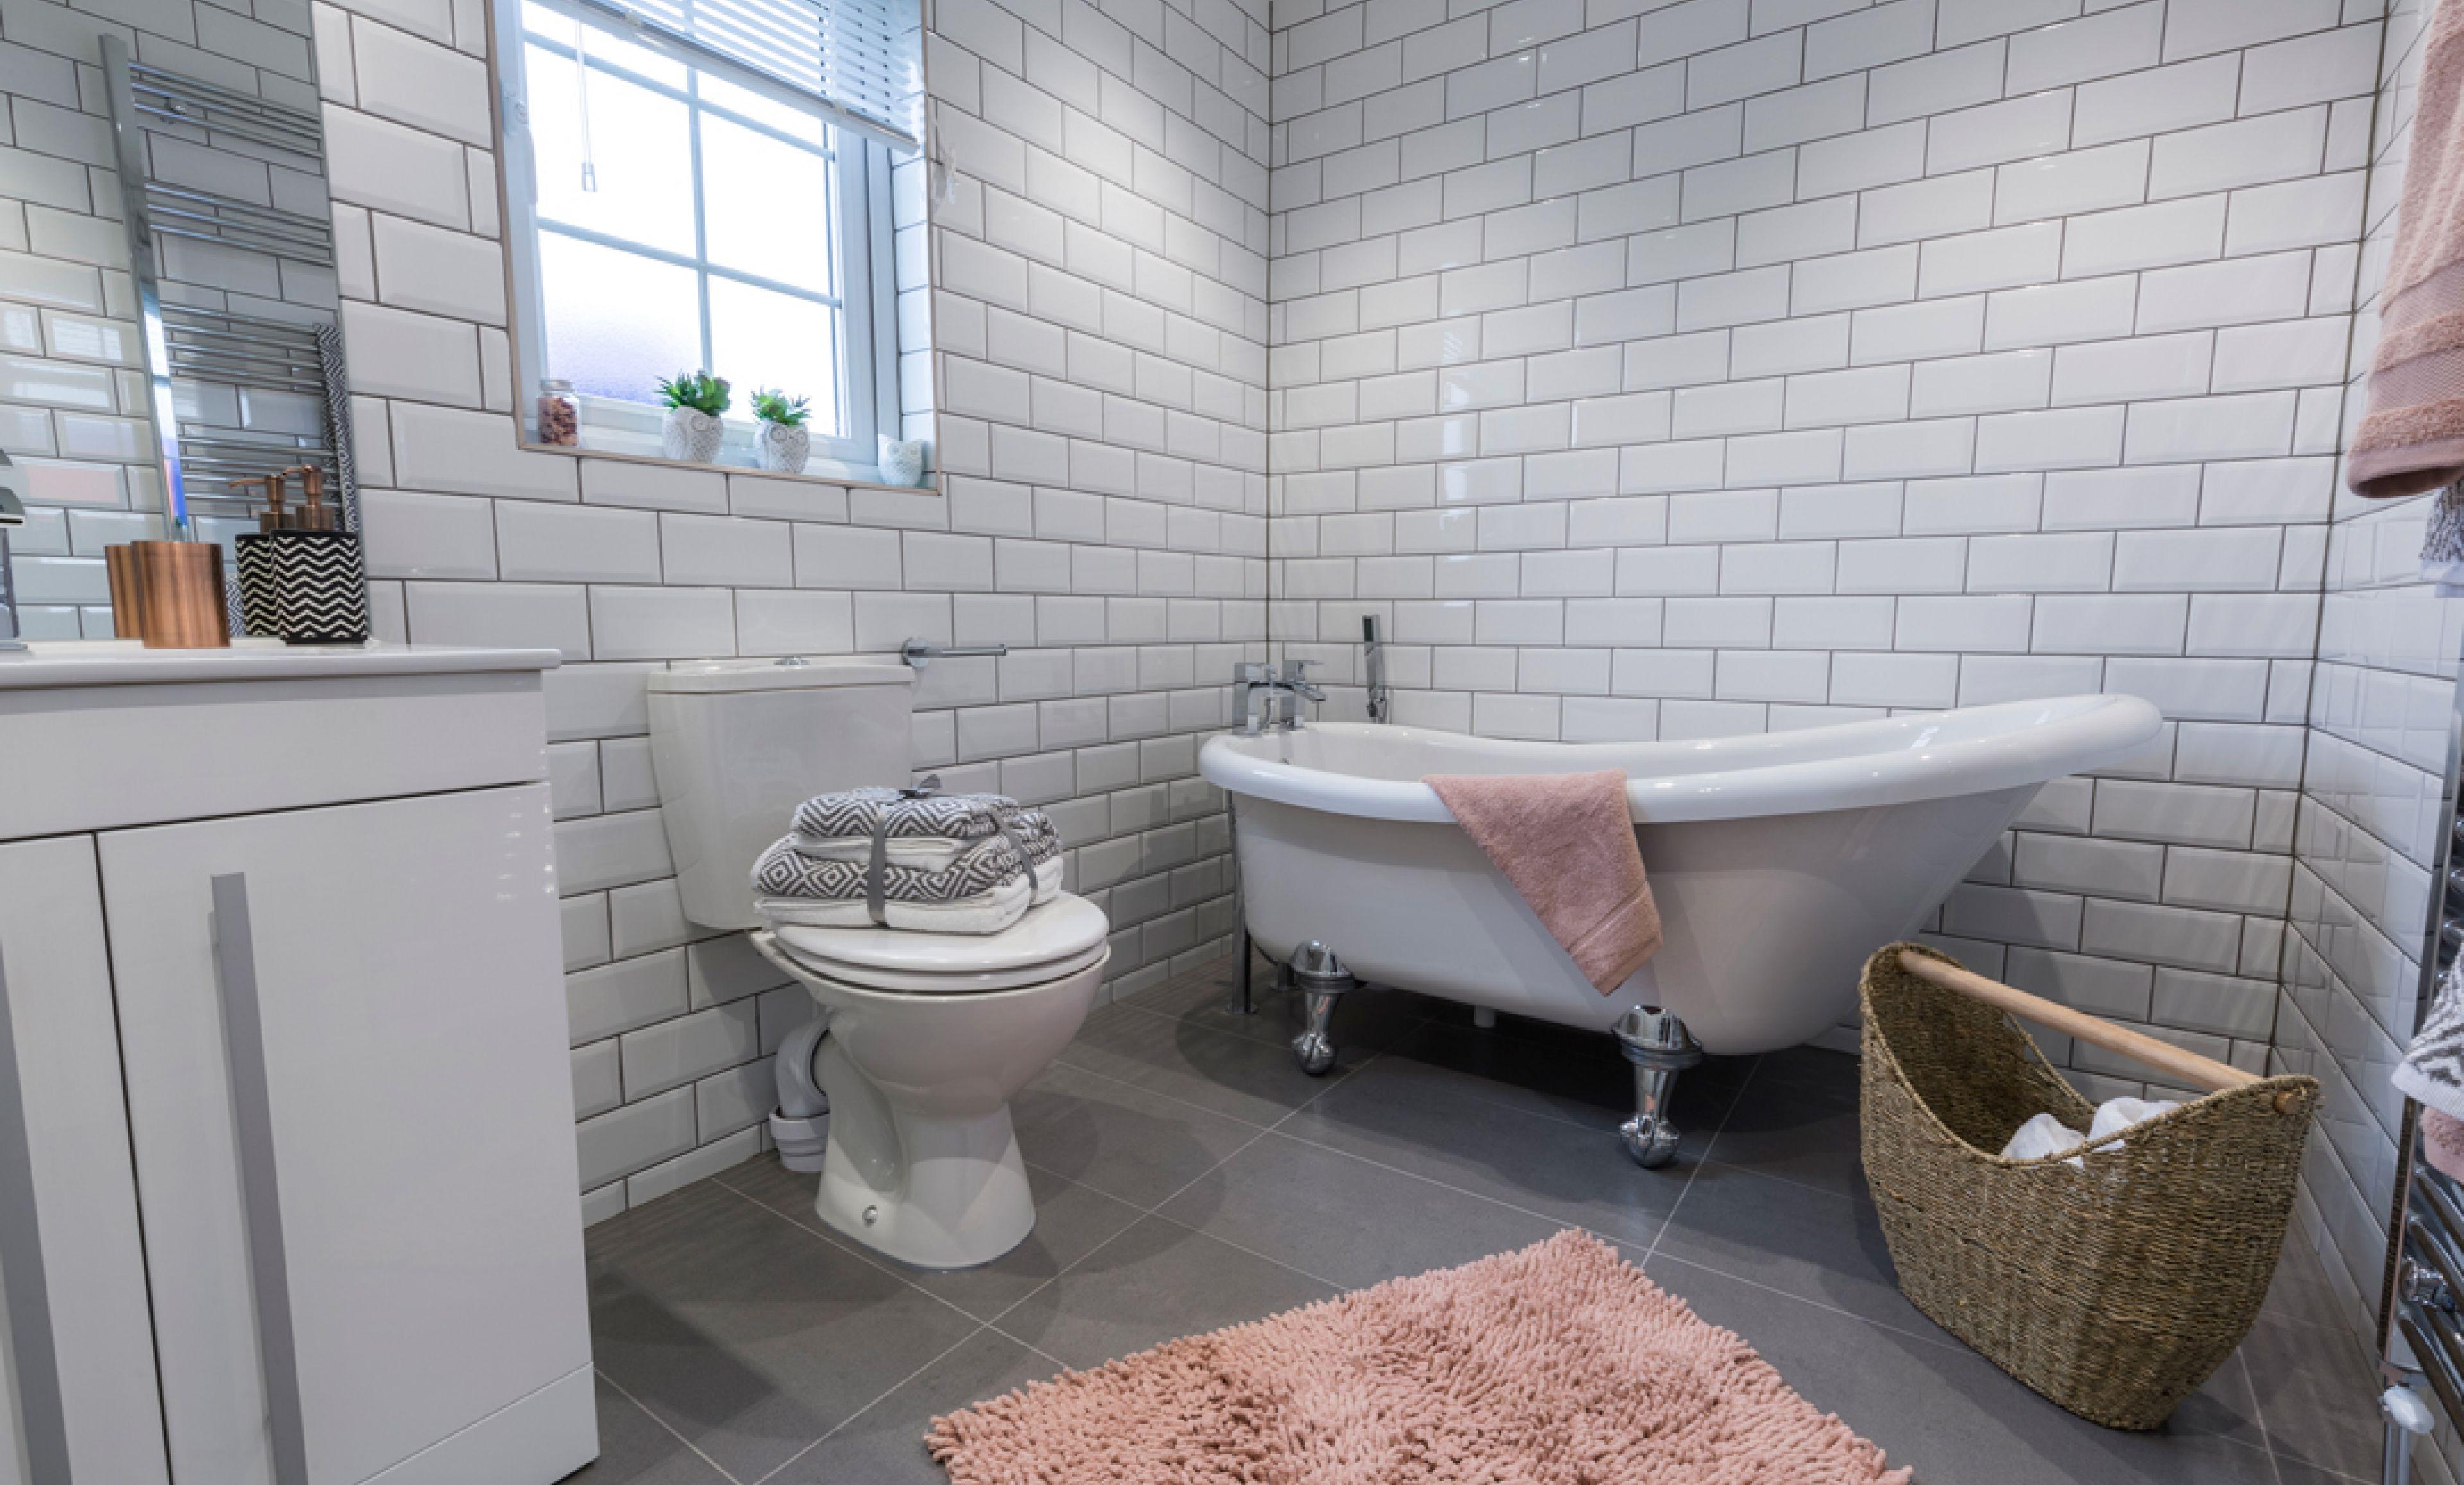 The Kensington bathroom